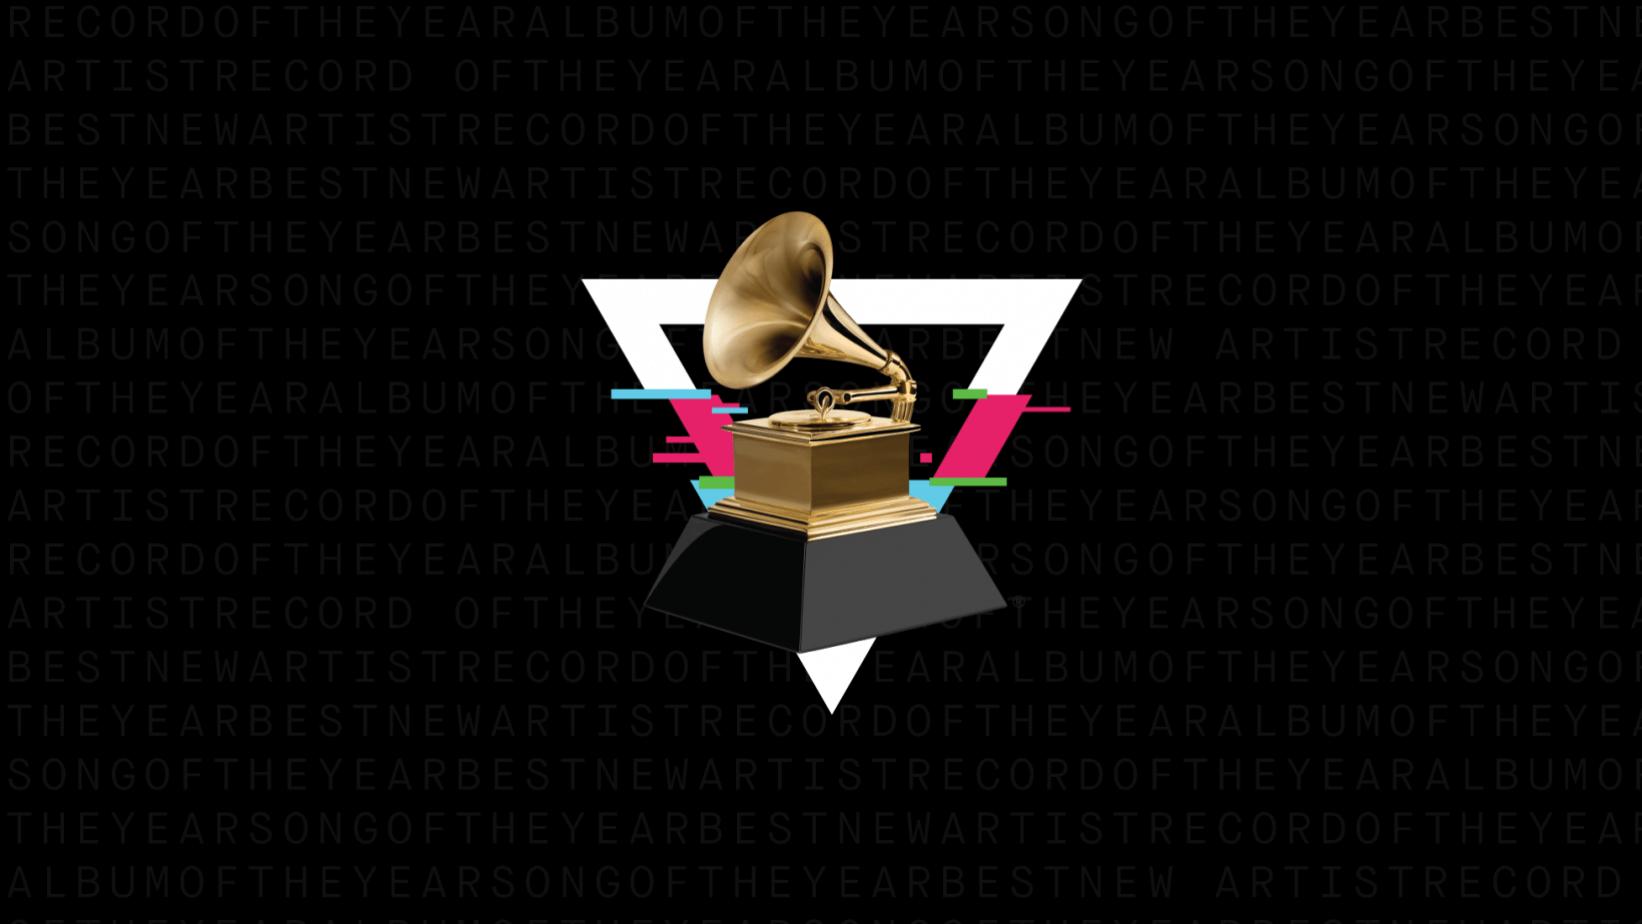 Lizzo Billie Eilish And Blake Shelton To Perform On The 2020 Grammy Awards In 2020 Grammy Awards Grammy Grammy Nominees